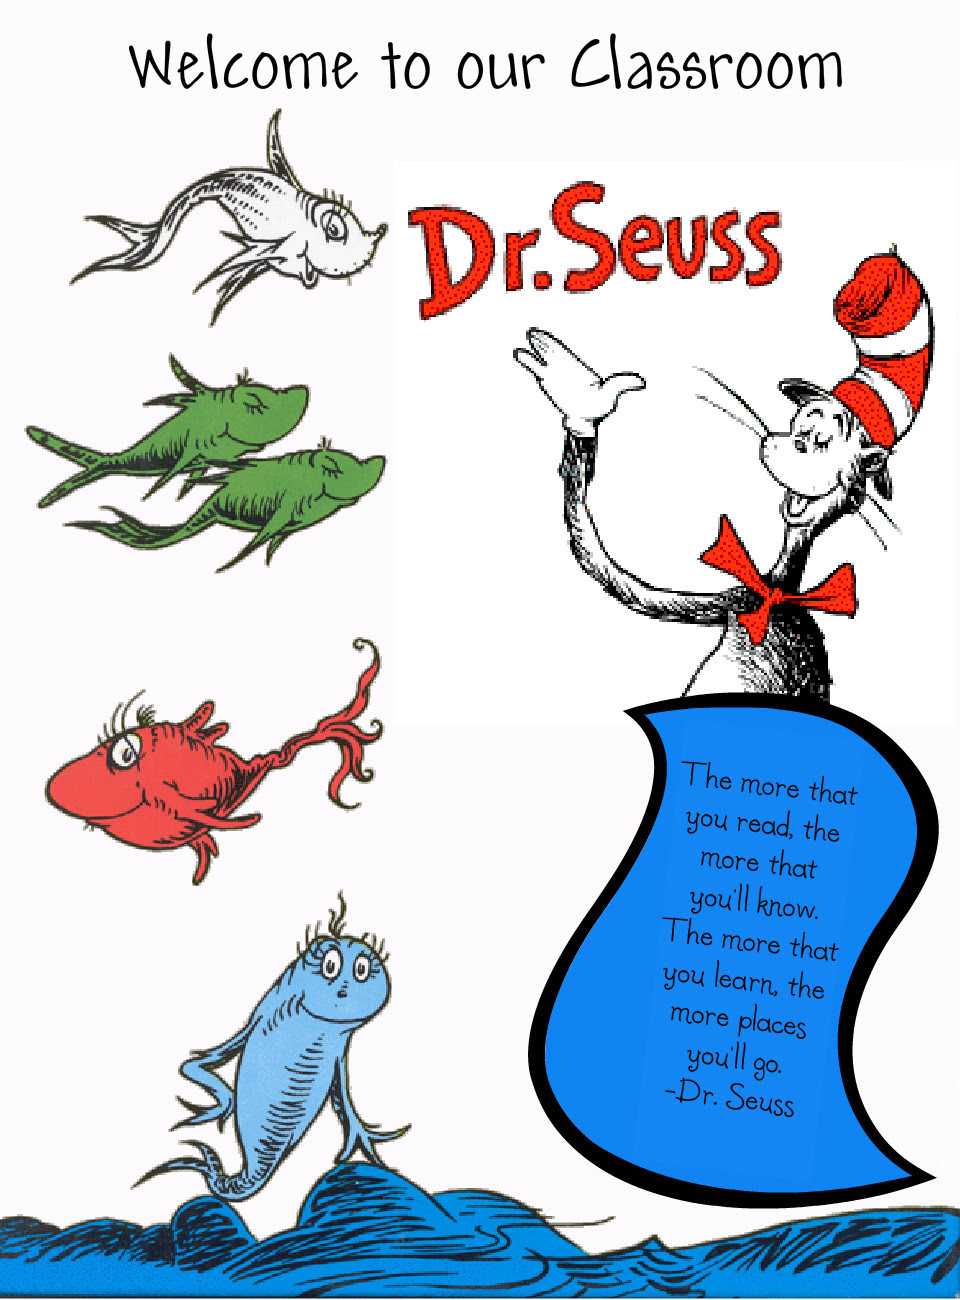 Dr Seuss Fish Clip Art Colouring Pages (page 2) - Cliparts.co